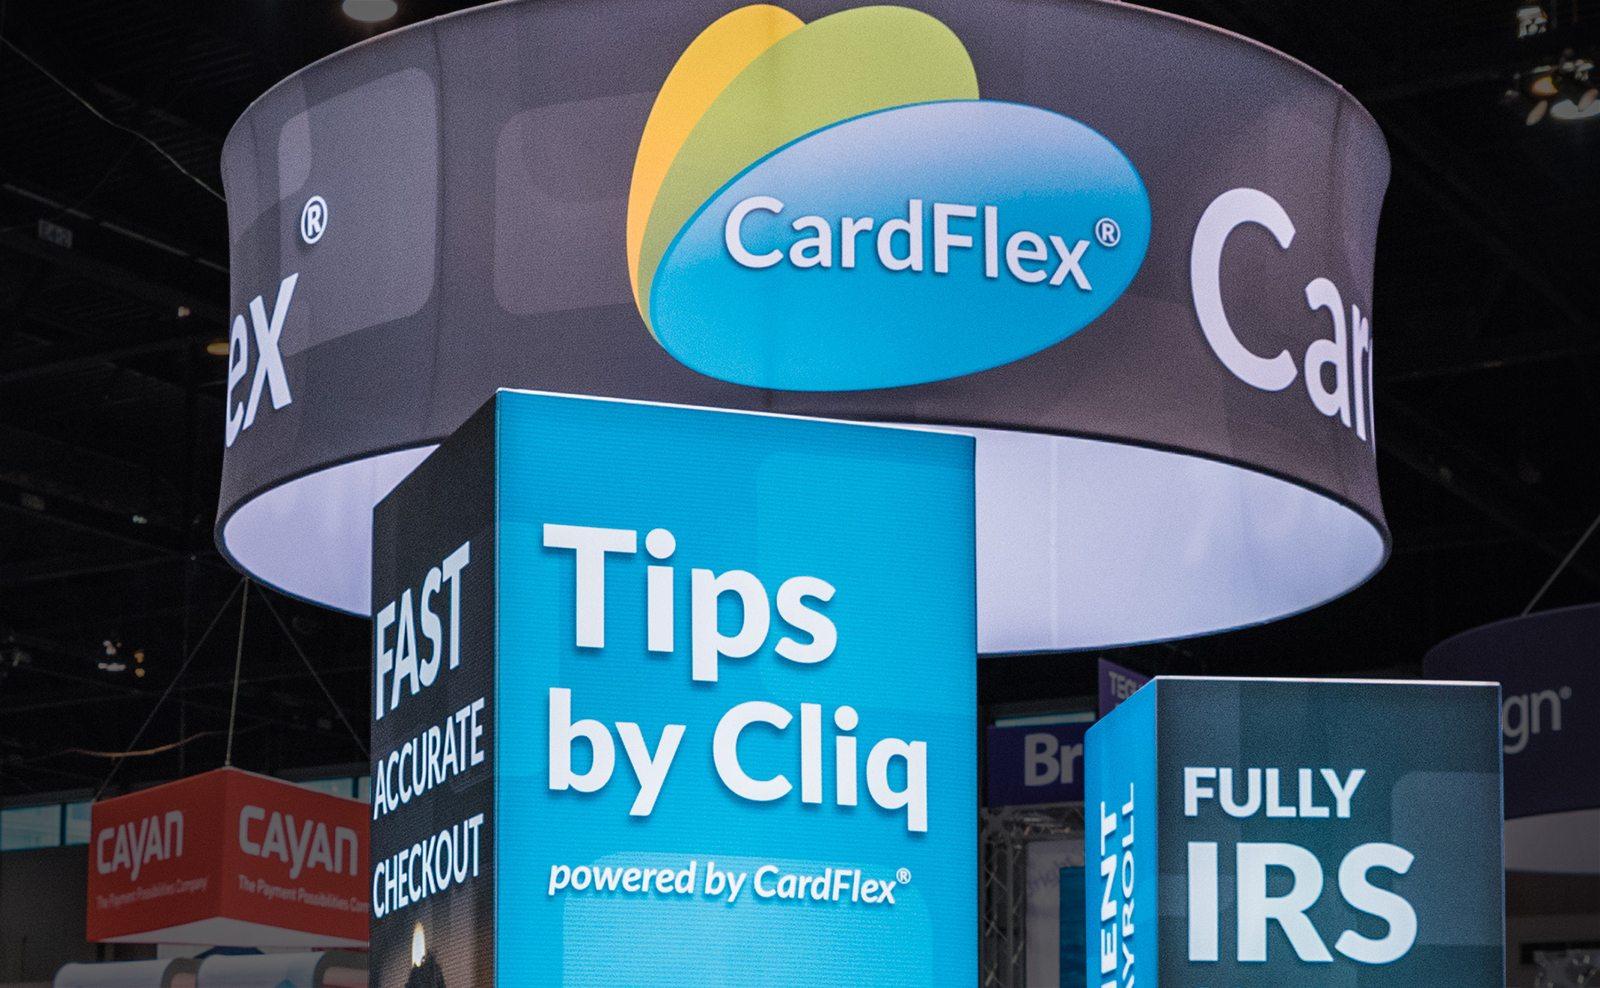 CardFlex_hanging_sign